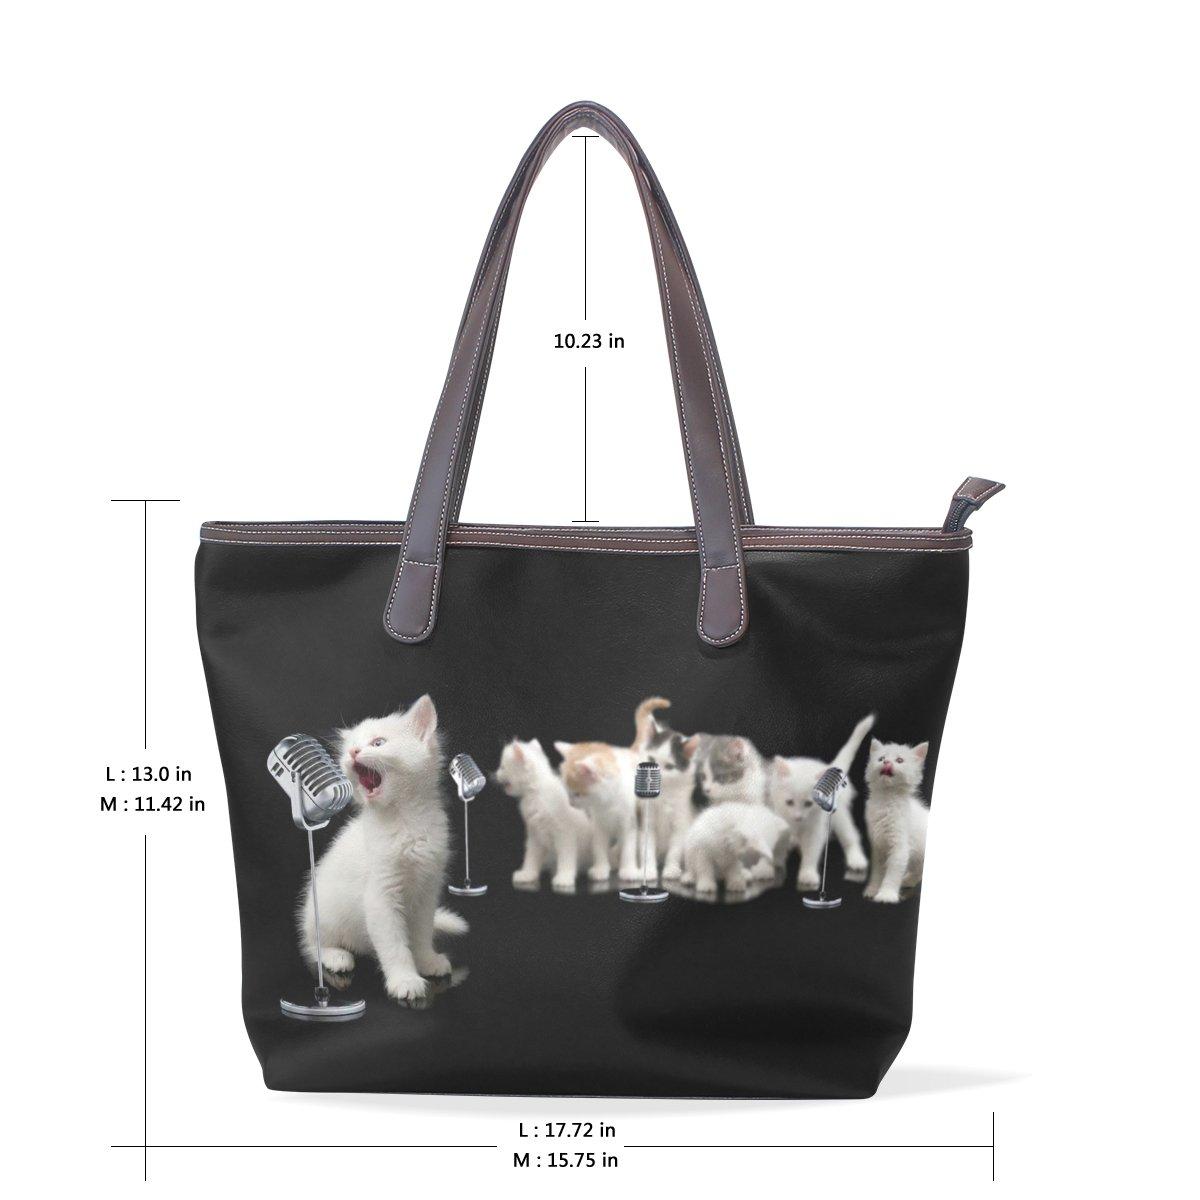 Mr.Weng Household Songs Cats Lady Handbag Tote Bag Zipper Shoulder Bag